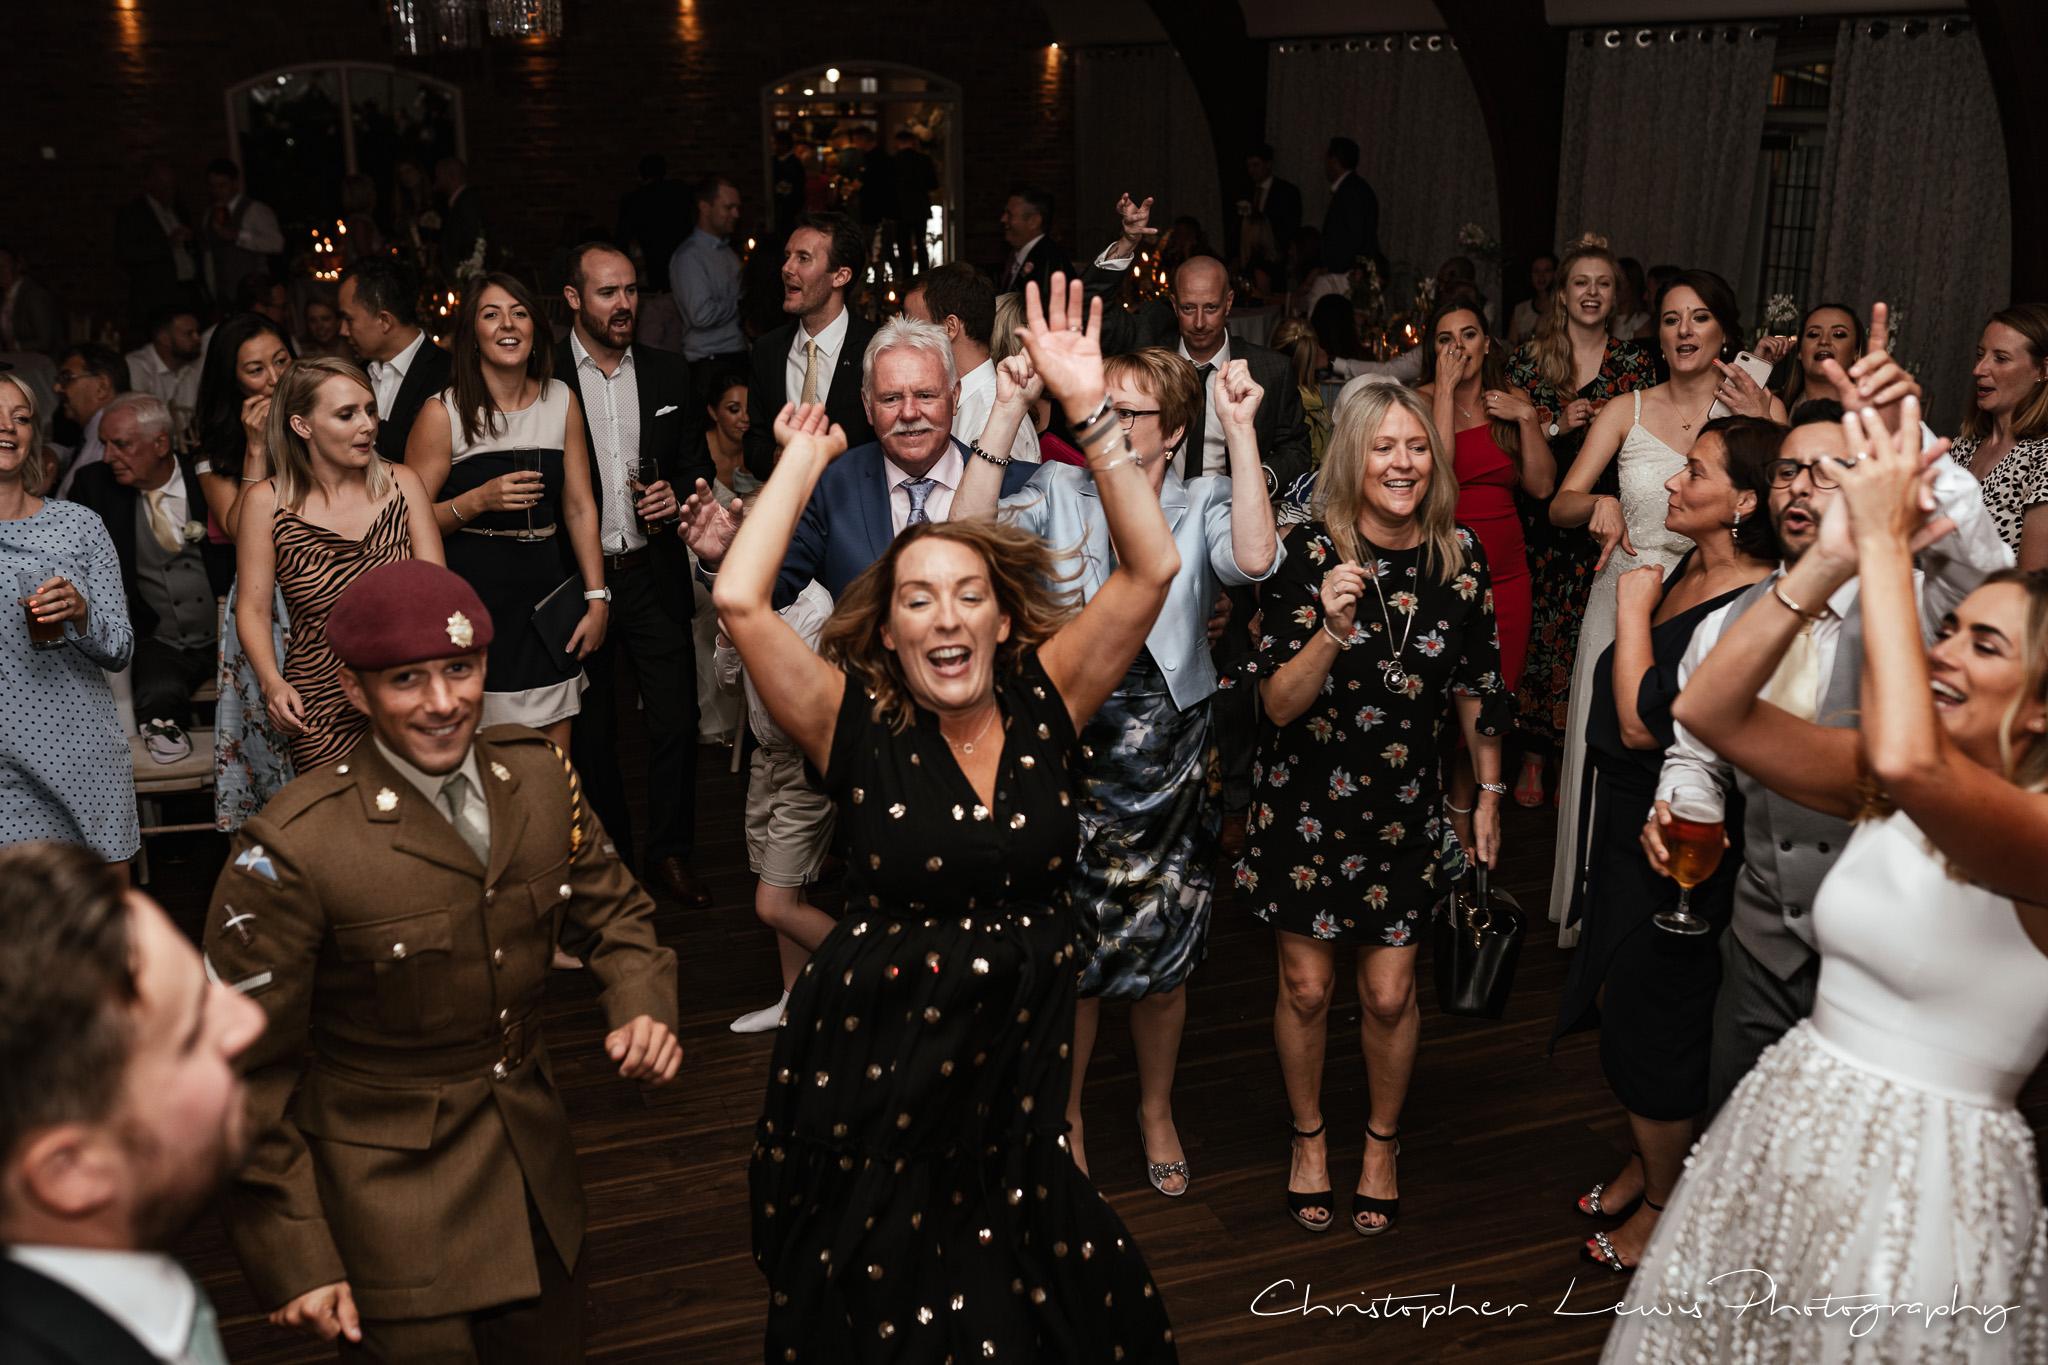 Colshaw Hall Wedding dance floor